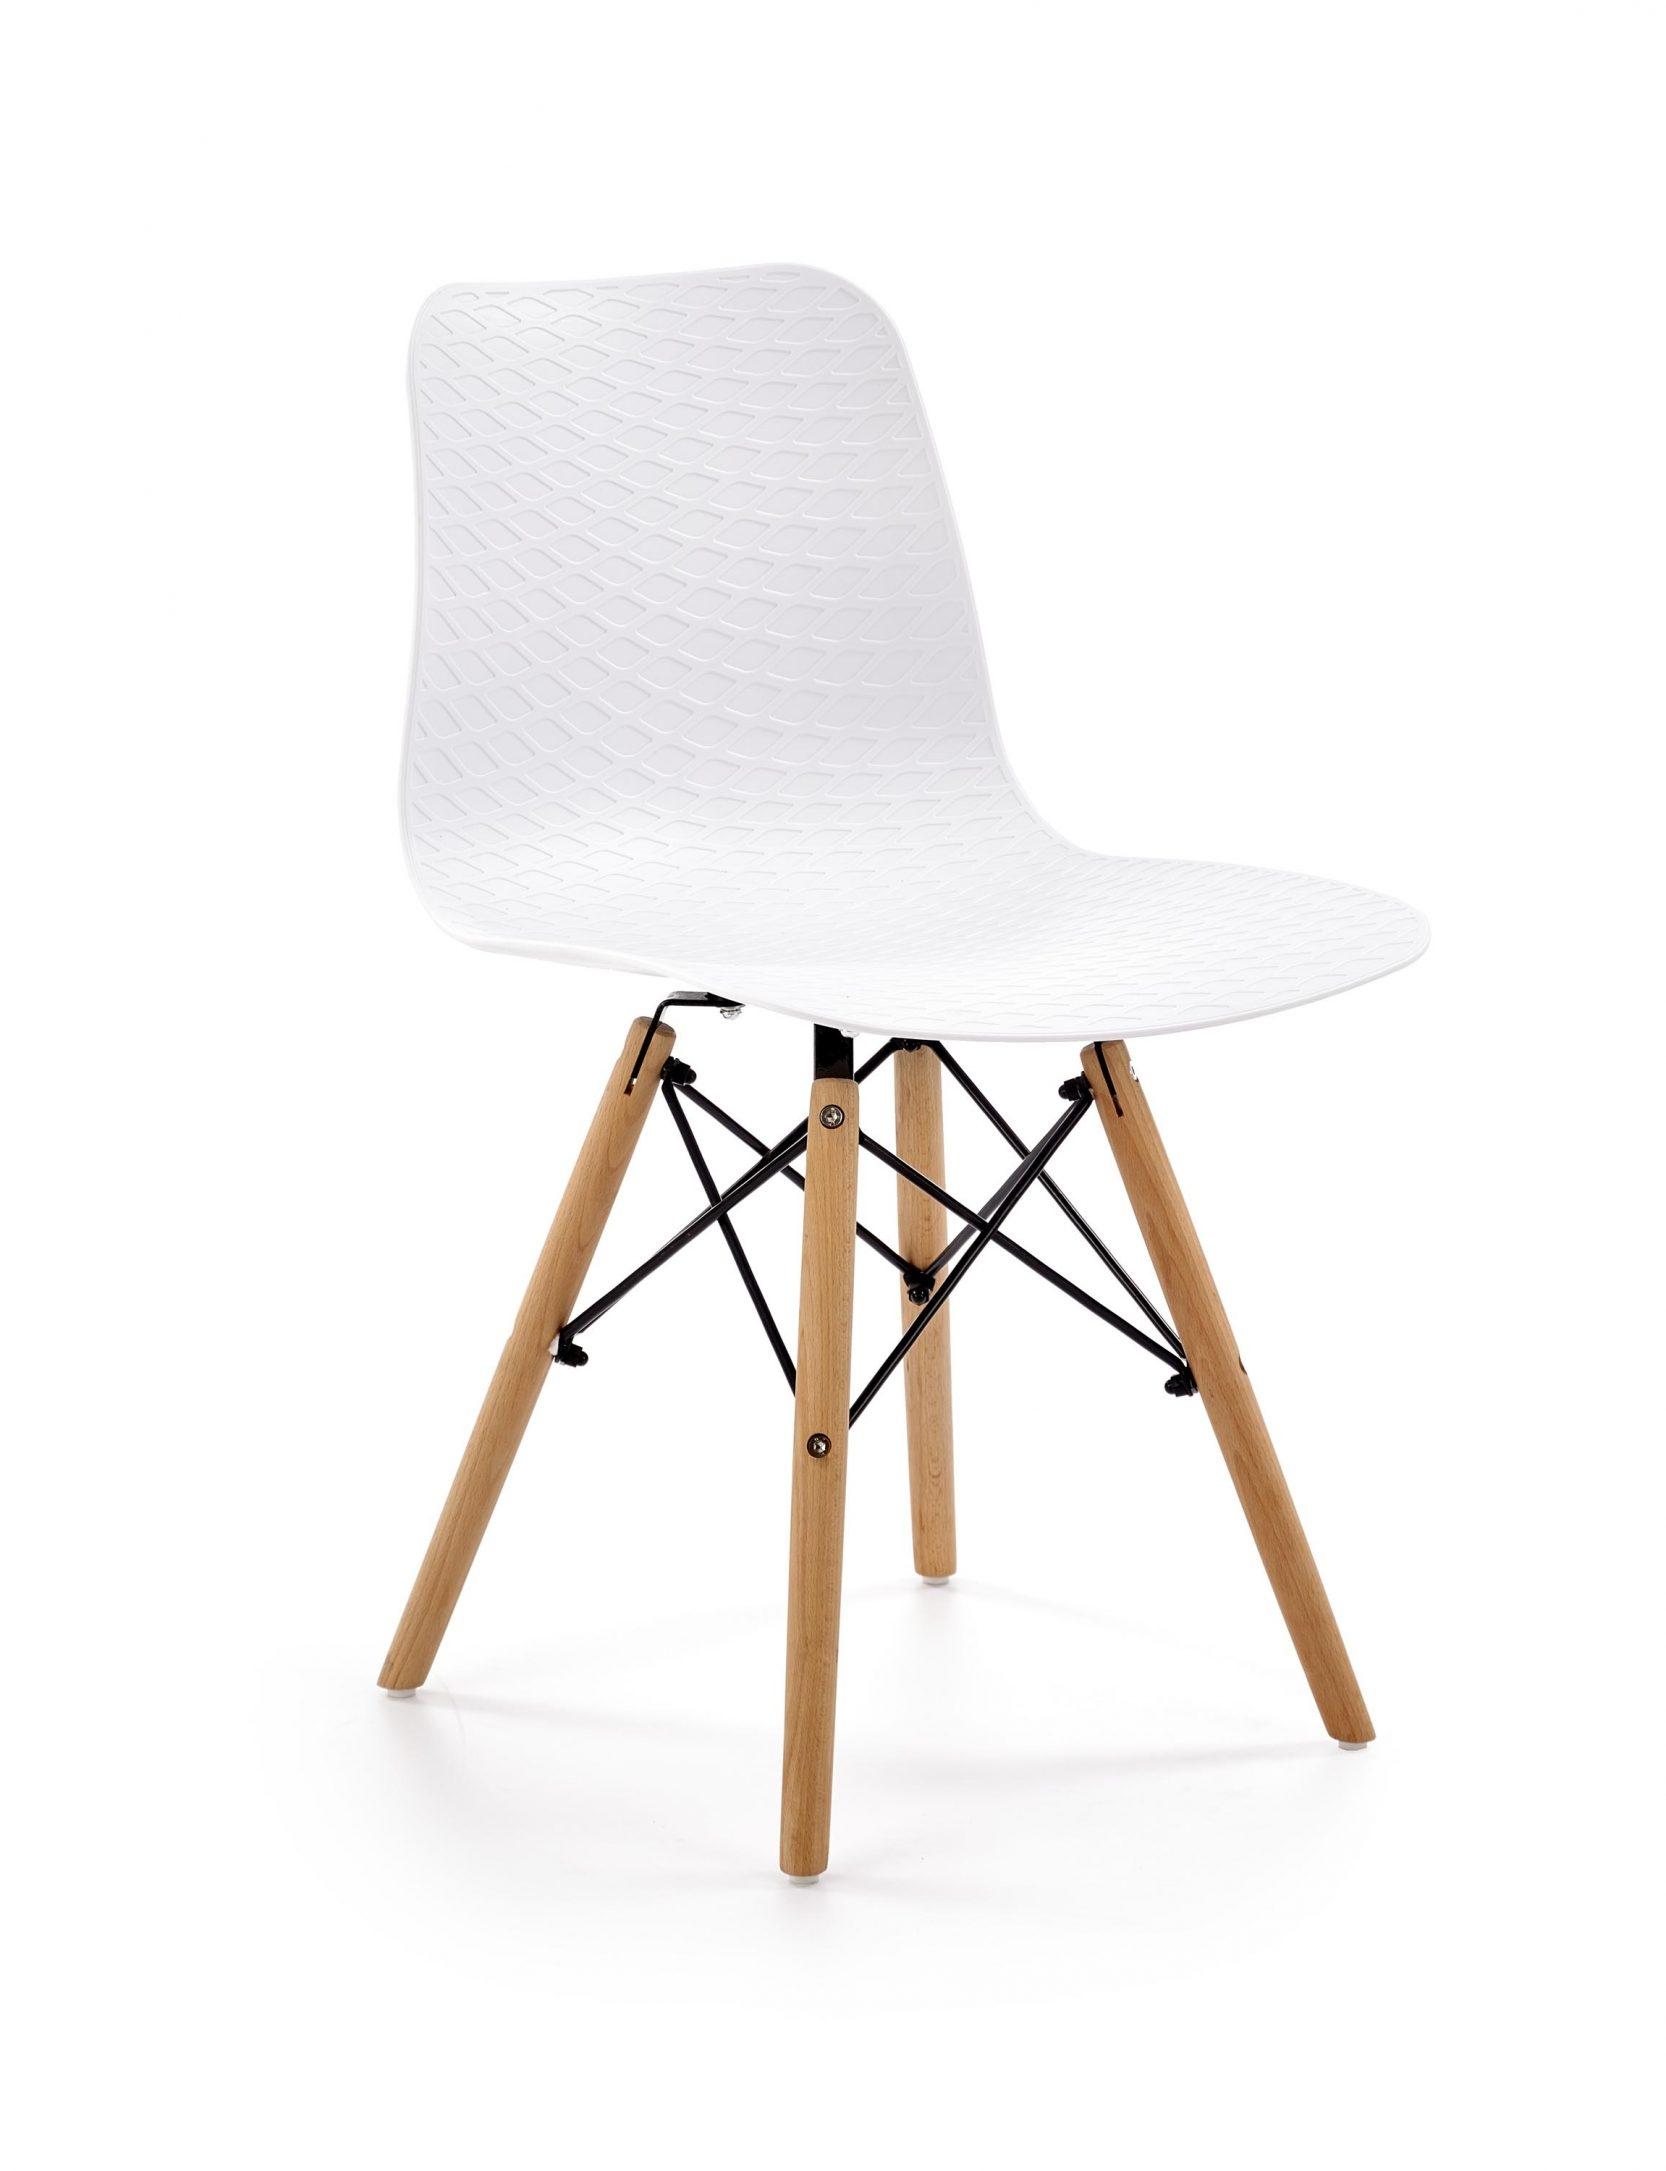 Scaun din plastic, cu picioare din lemn K325 Alb / Natural, l44xA51xH77 cm